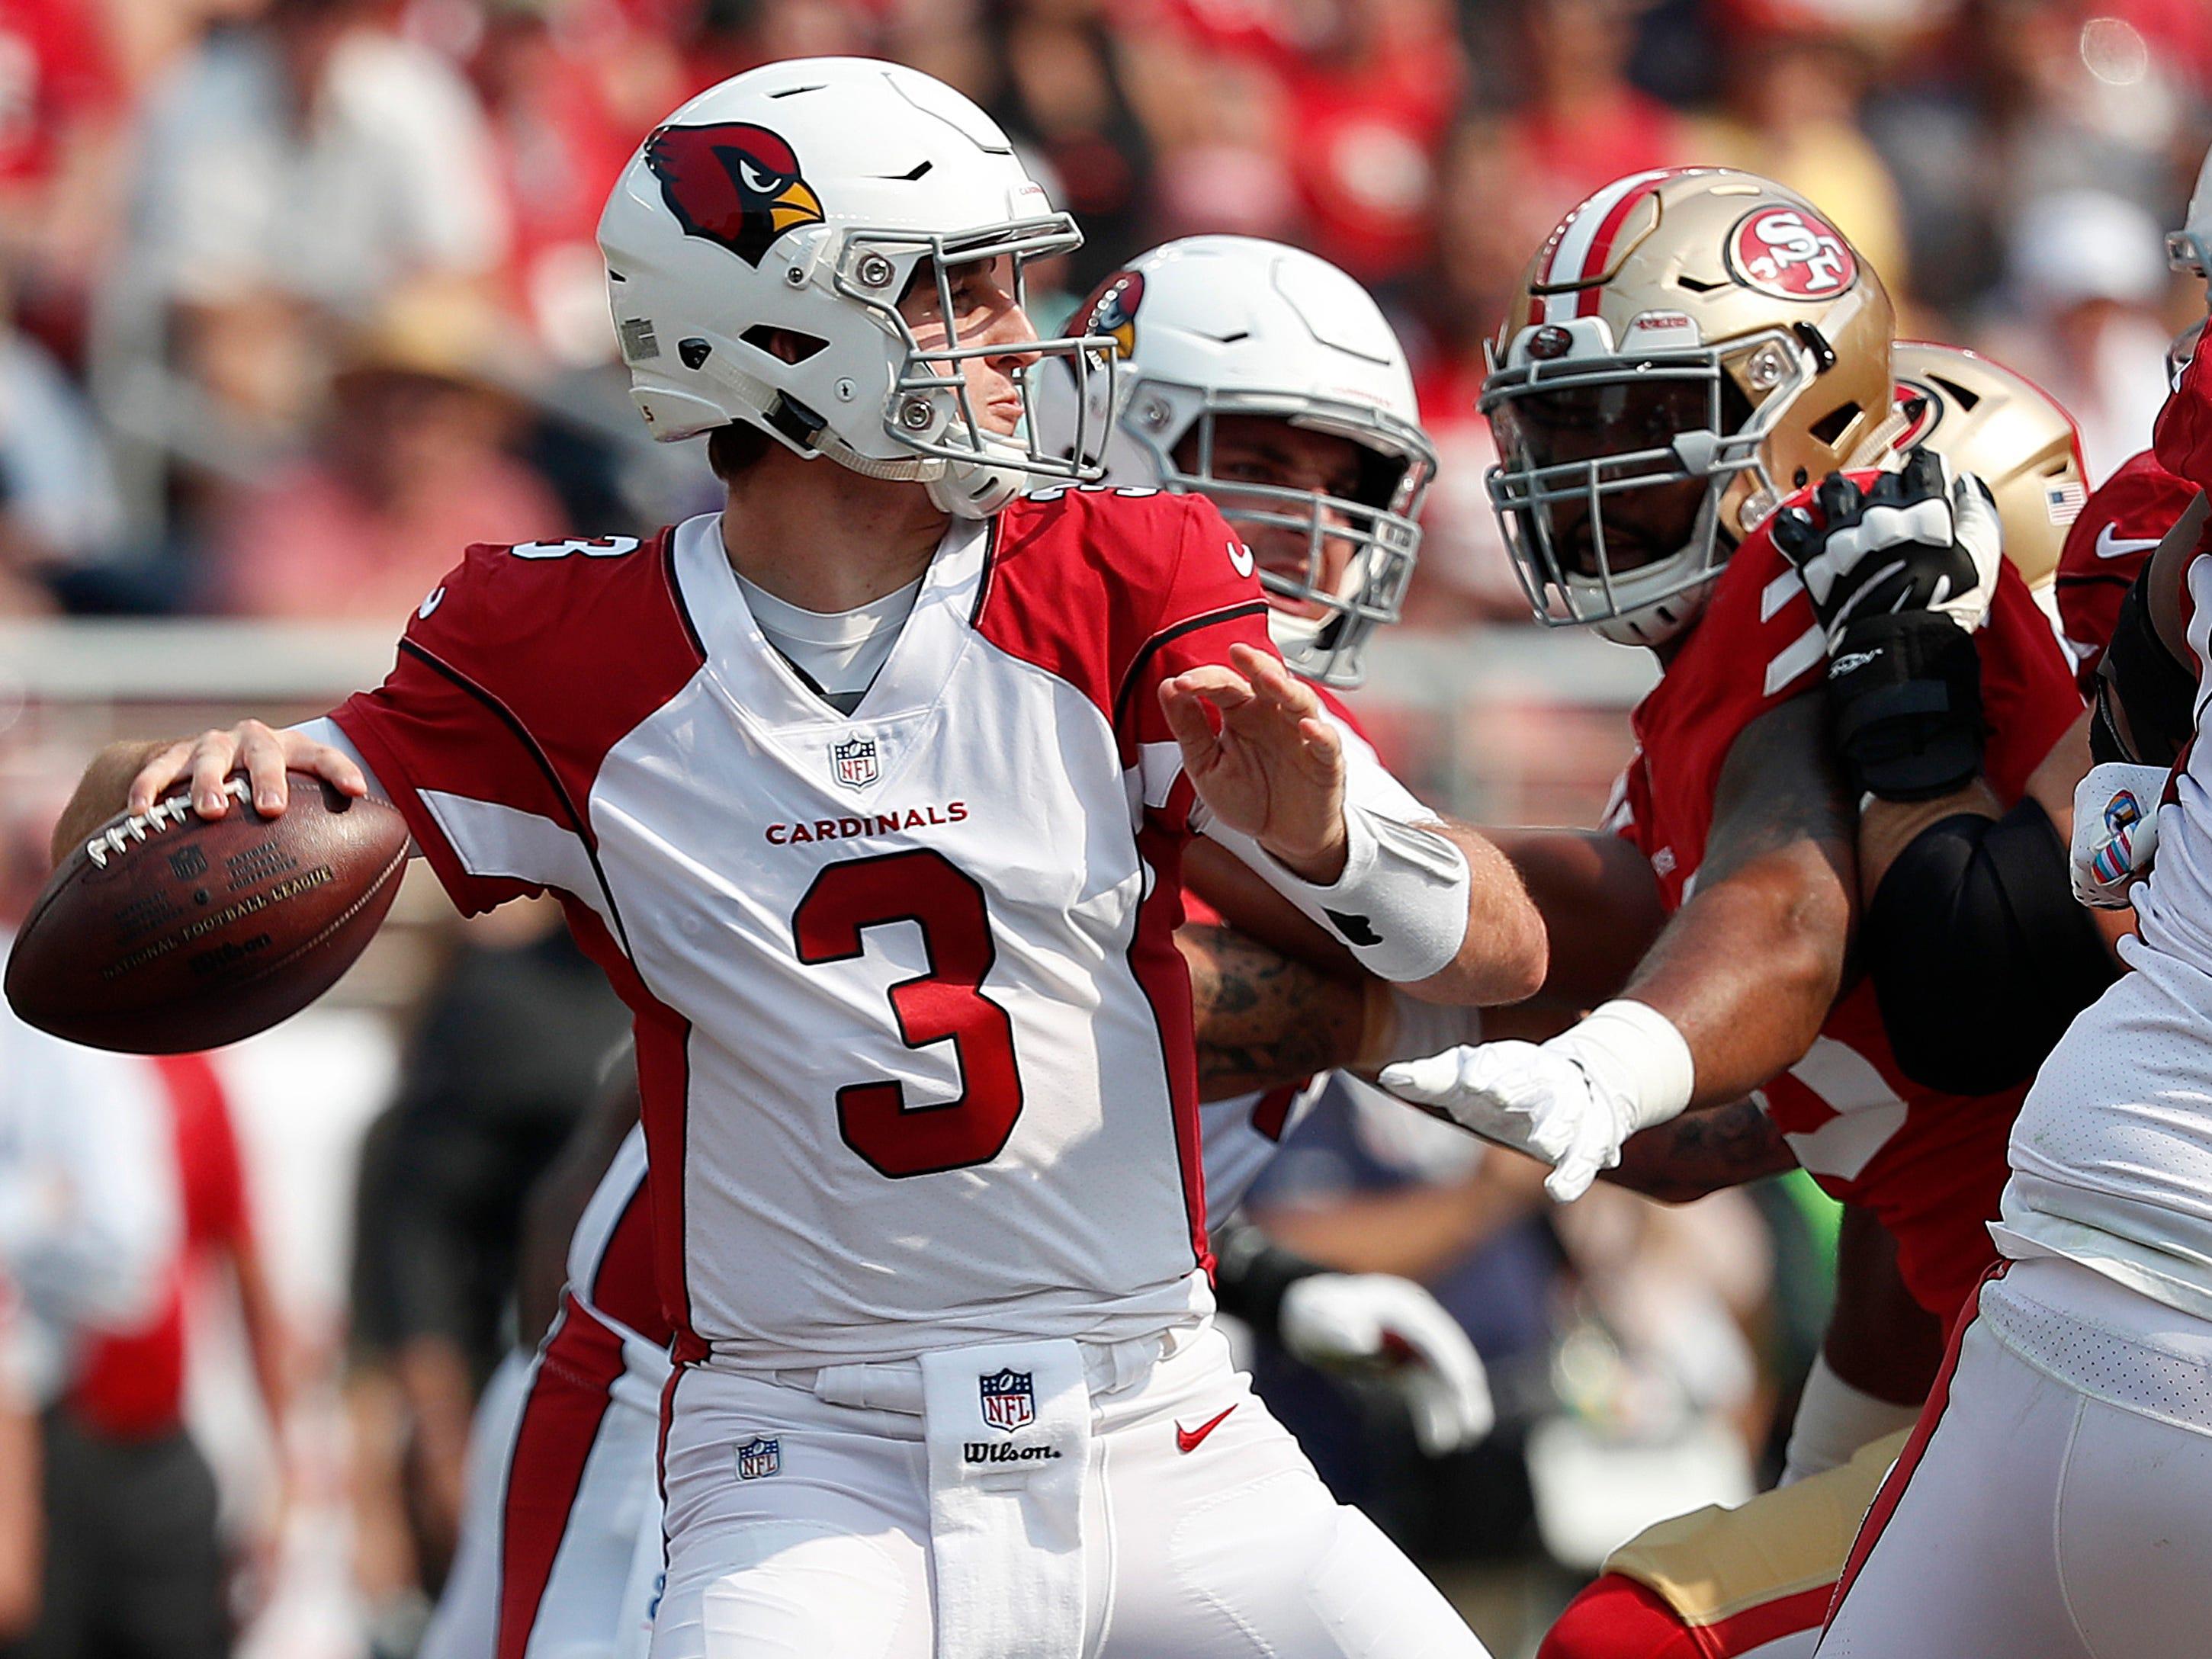 Arizona Cardinals quarterback Josh Rosen (3) looks to pass against the San Francisco 49ers during the first half of an NFL football game in Santa Clara, Calif., Sunday, Oct. 7, 2018.